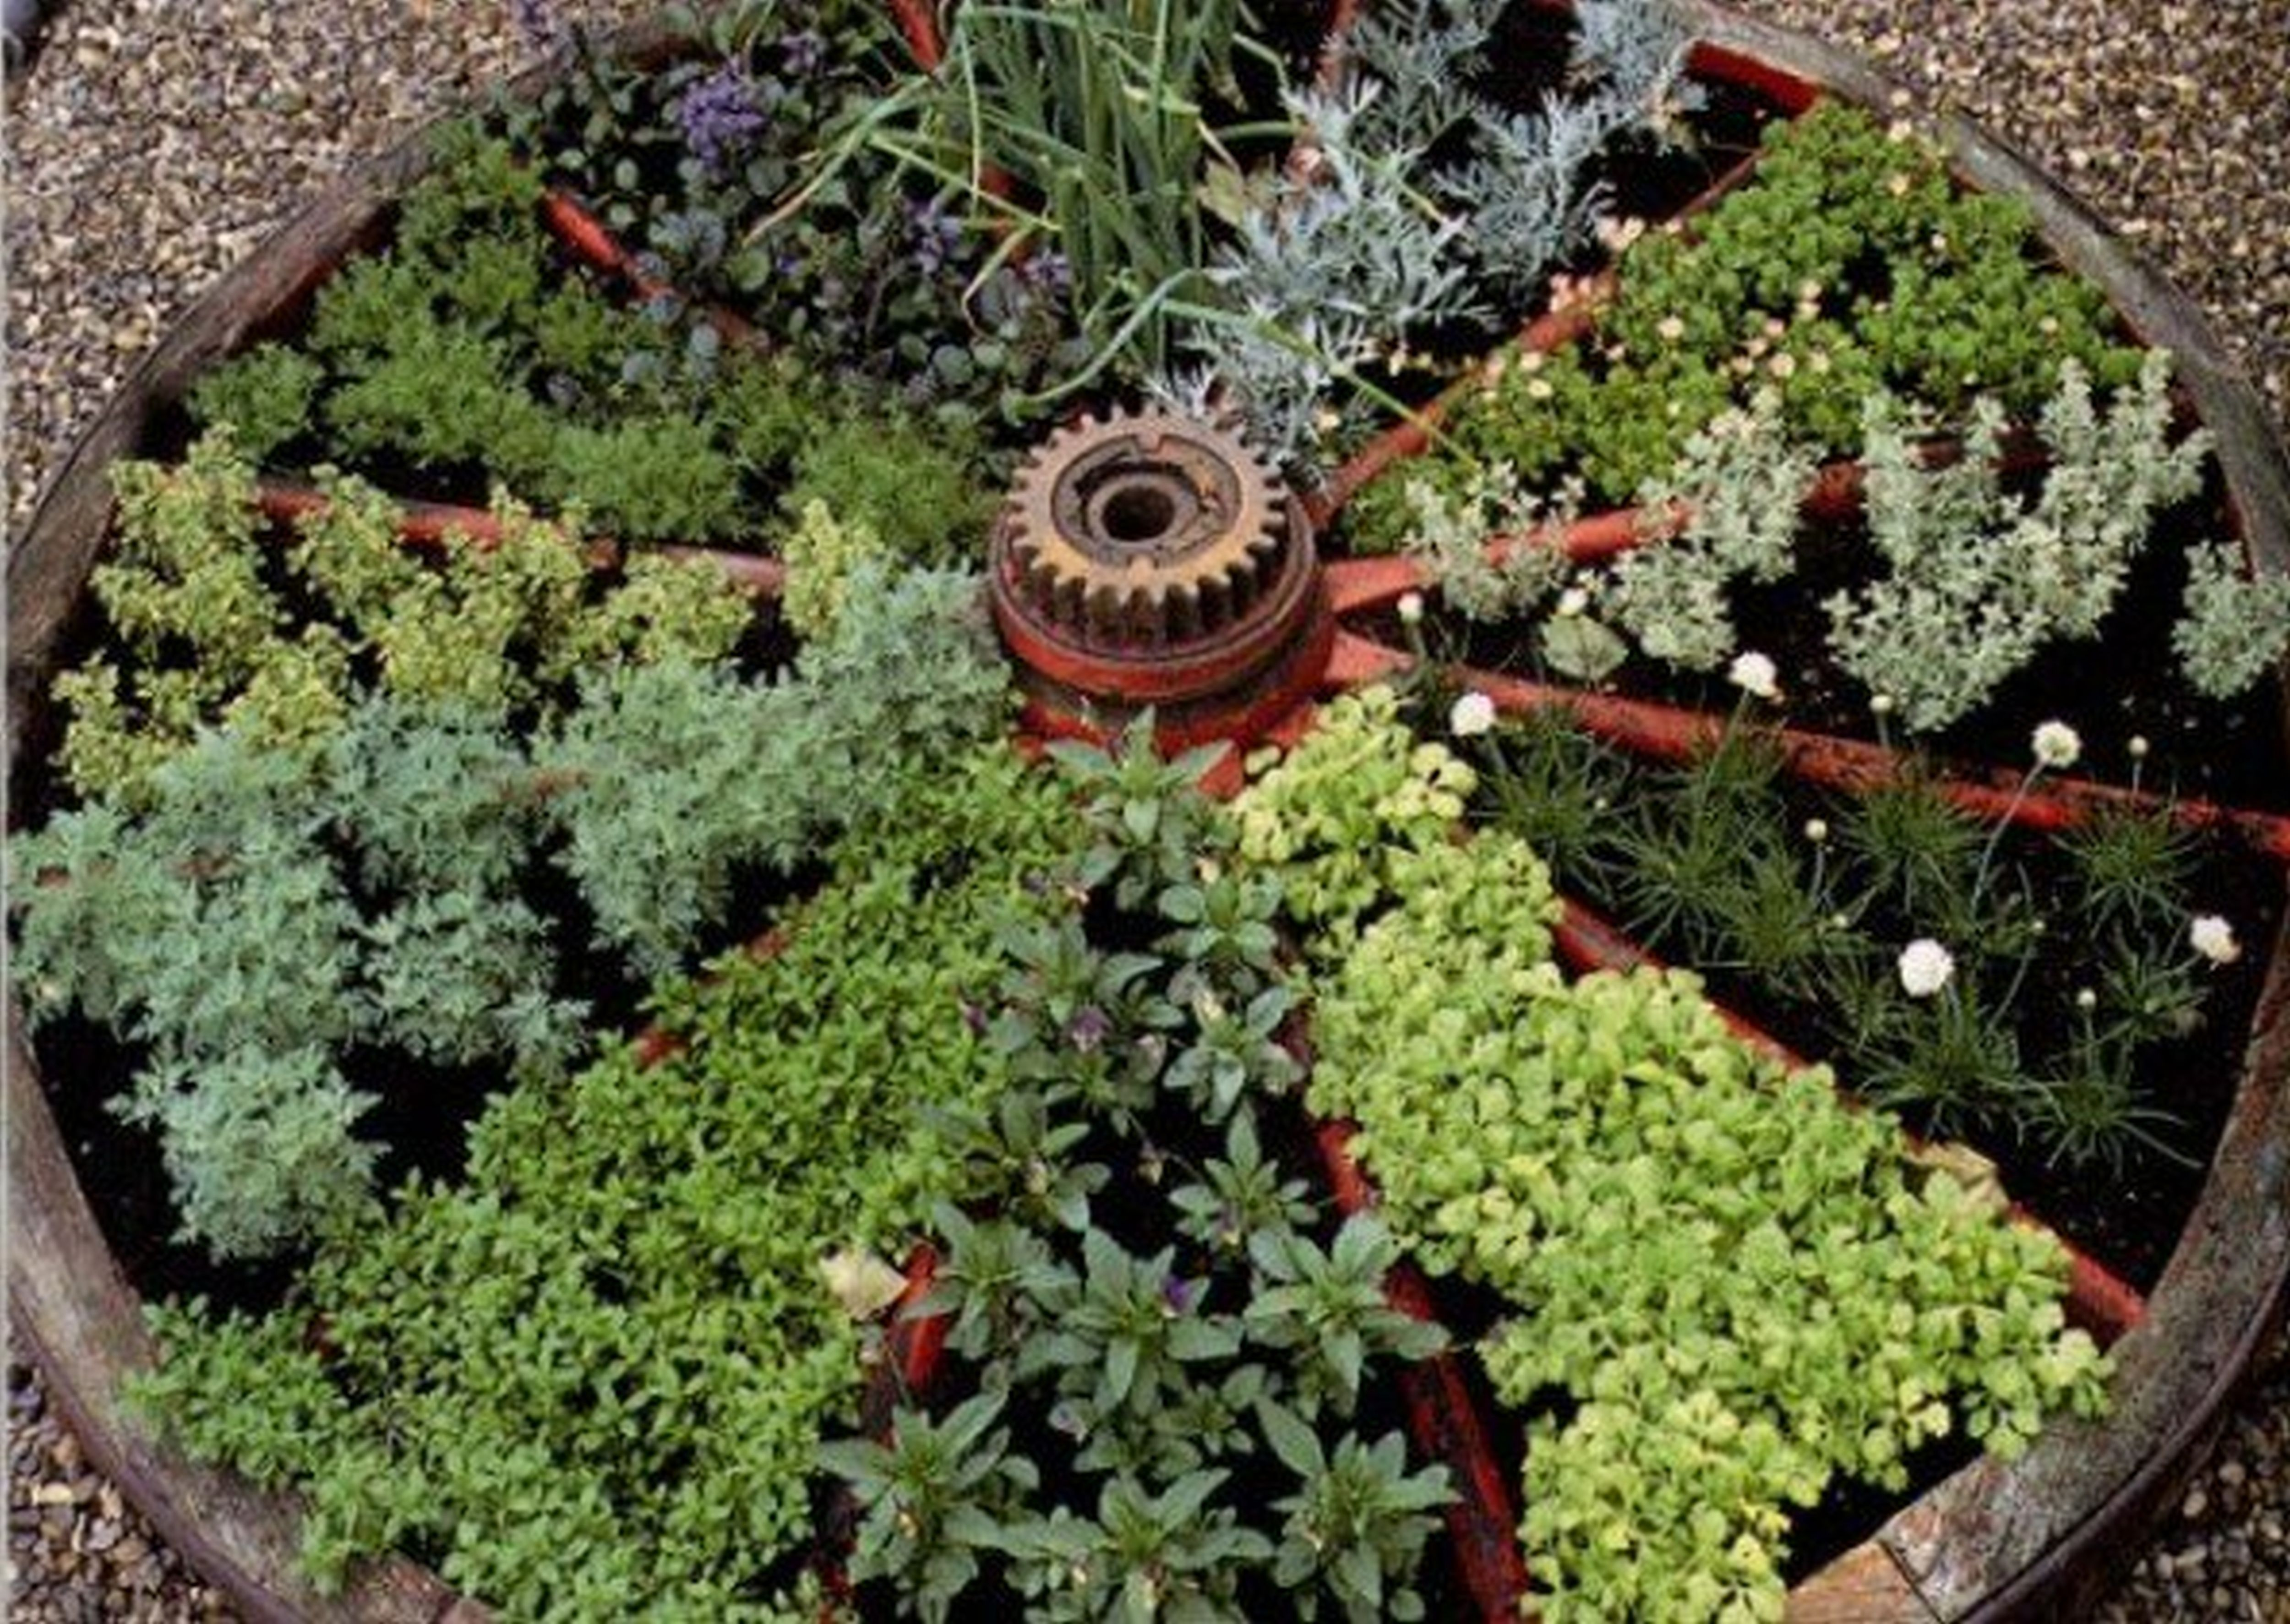 30 Herb Garden Ideas To Spice Up Your Life Doniczki 400 x 300